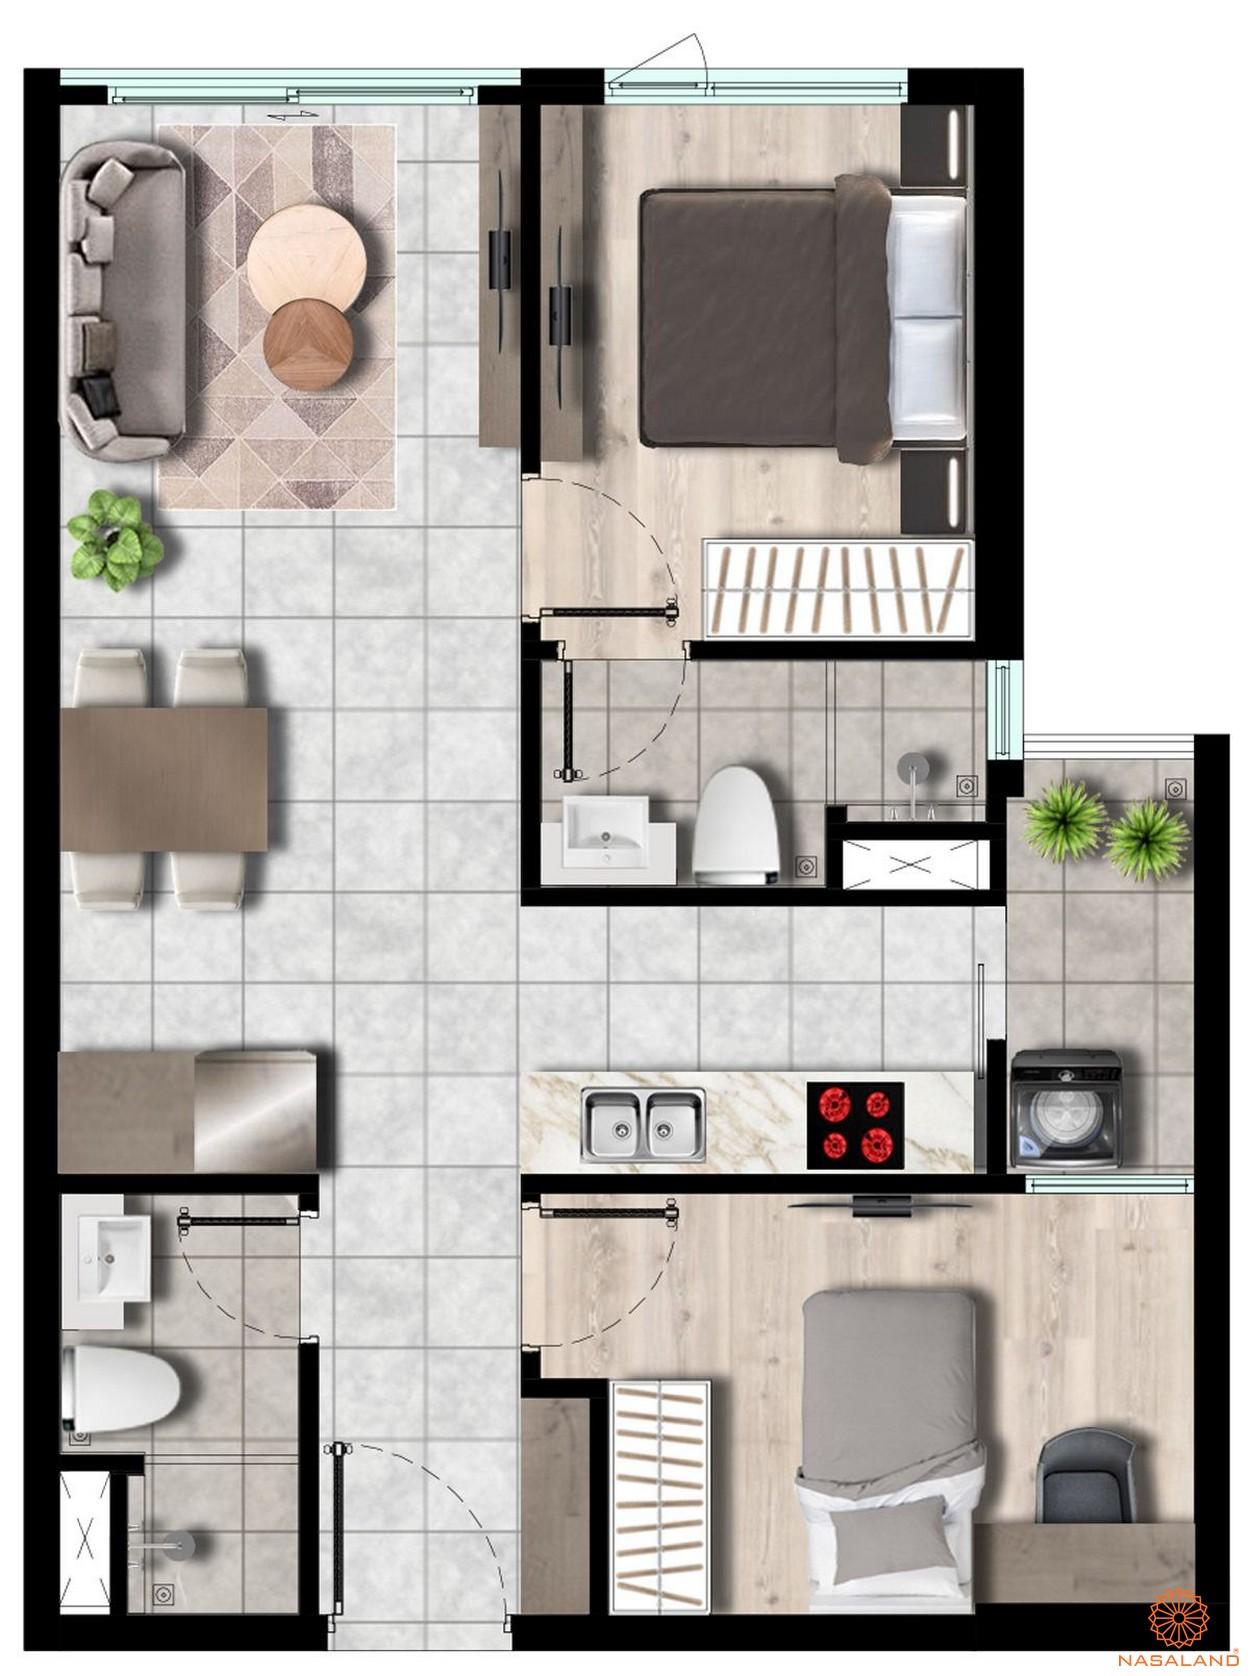 Thiết kế căn-hộ 2pn -2wc 59m2 West Gate